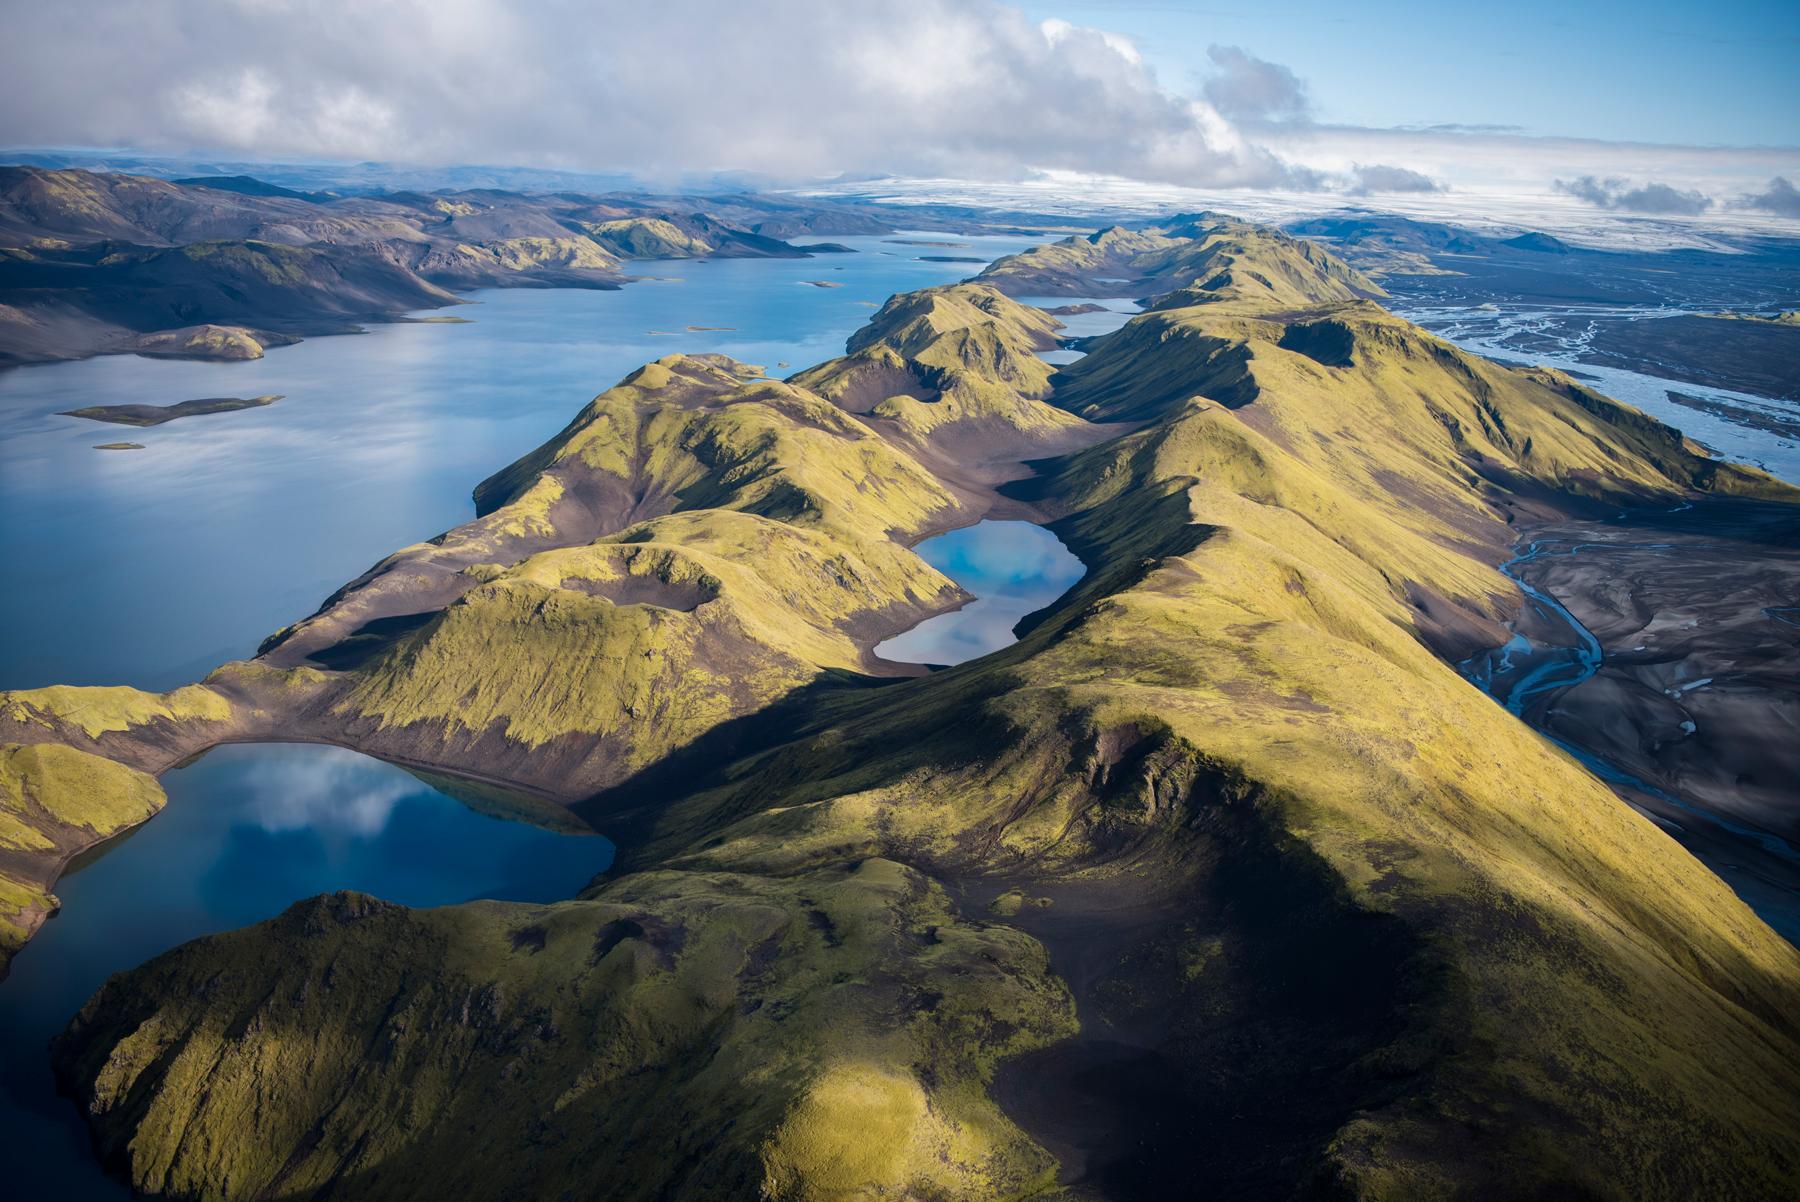 Island Multimediavortrag